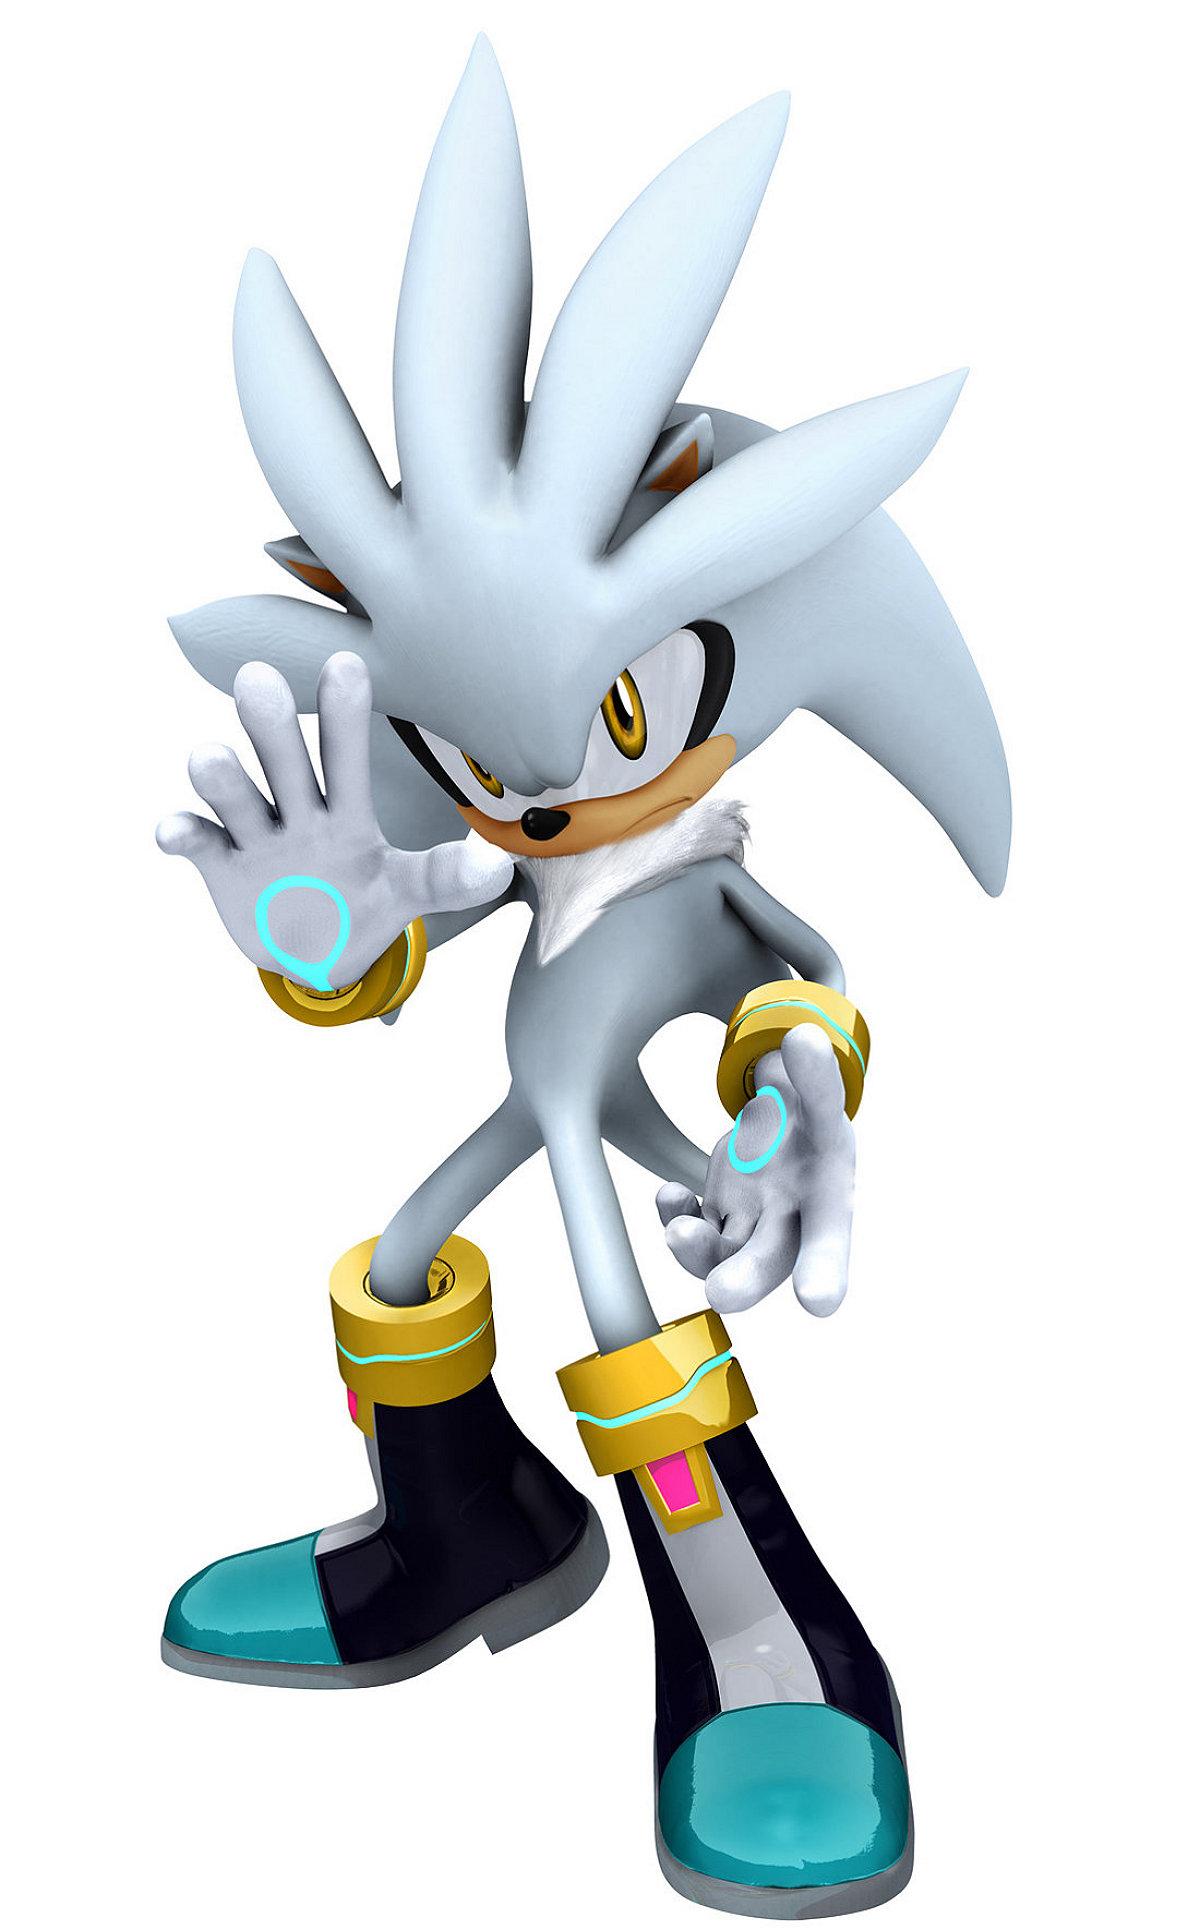 sonic the hedgehog digital - photo #15